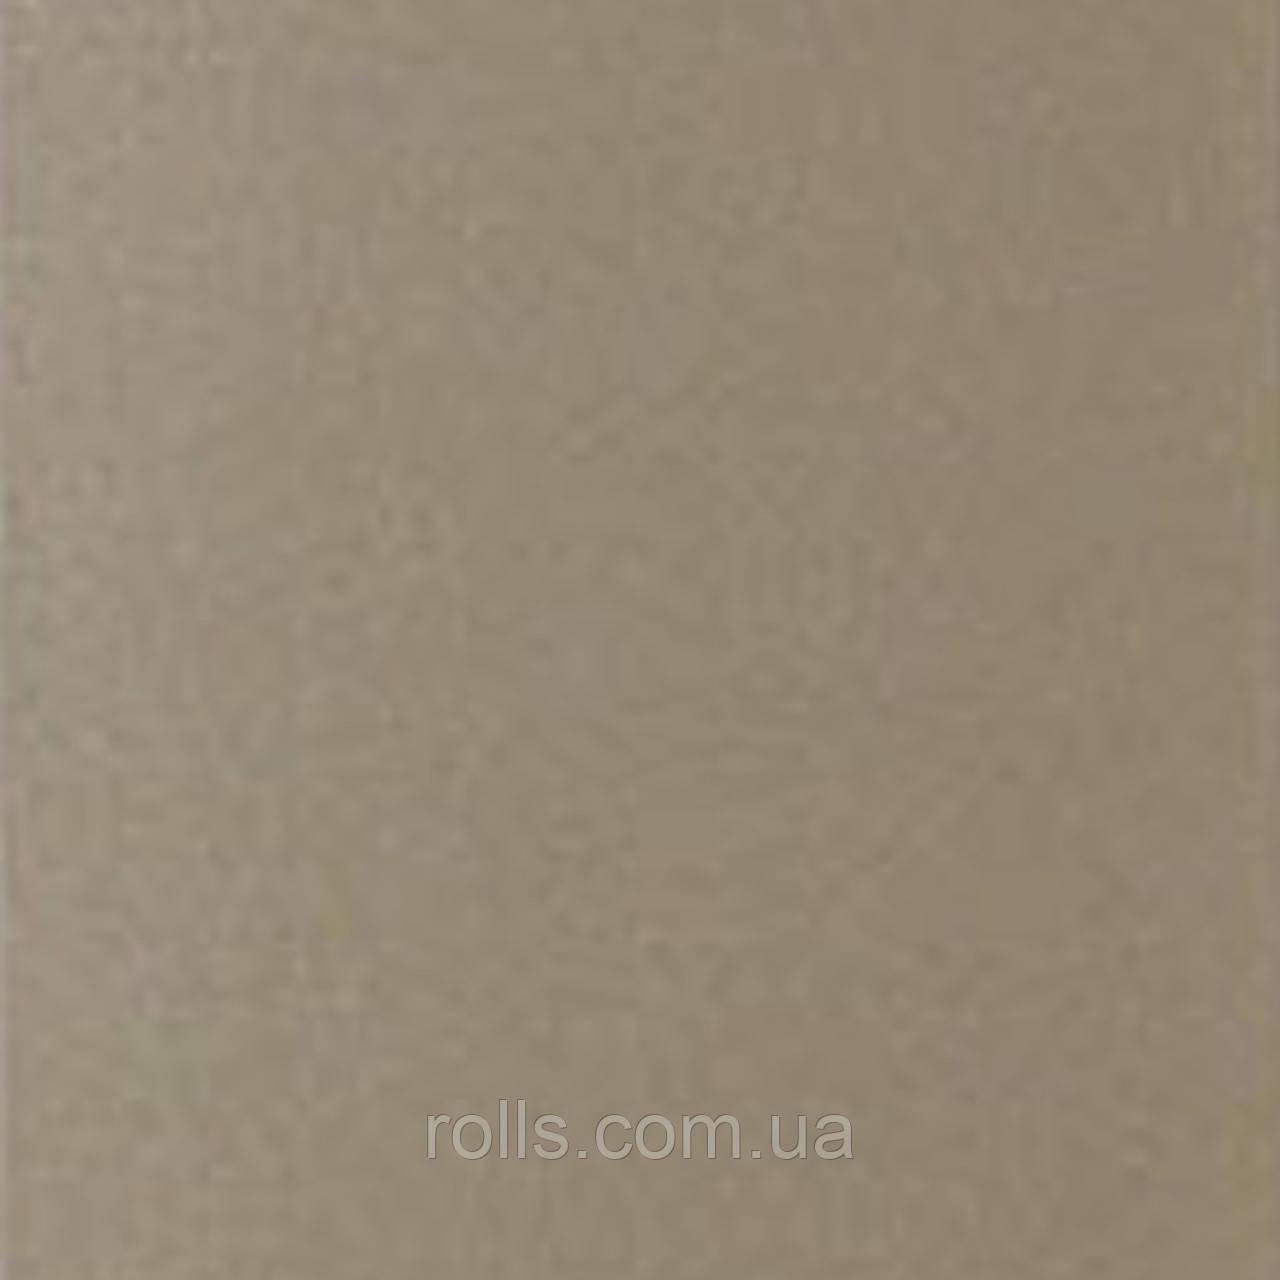 Лист алюминиевый плоский Prefalz PP99 №45 BRONZE БРОНЗОВЫЙ 0,7х1000х2000